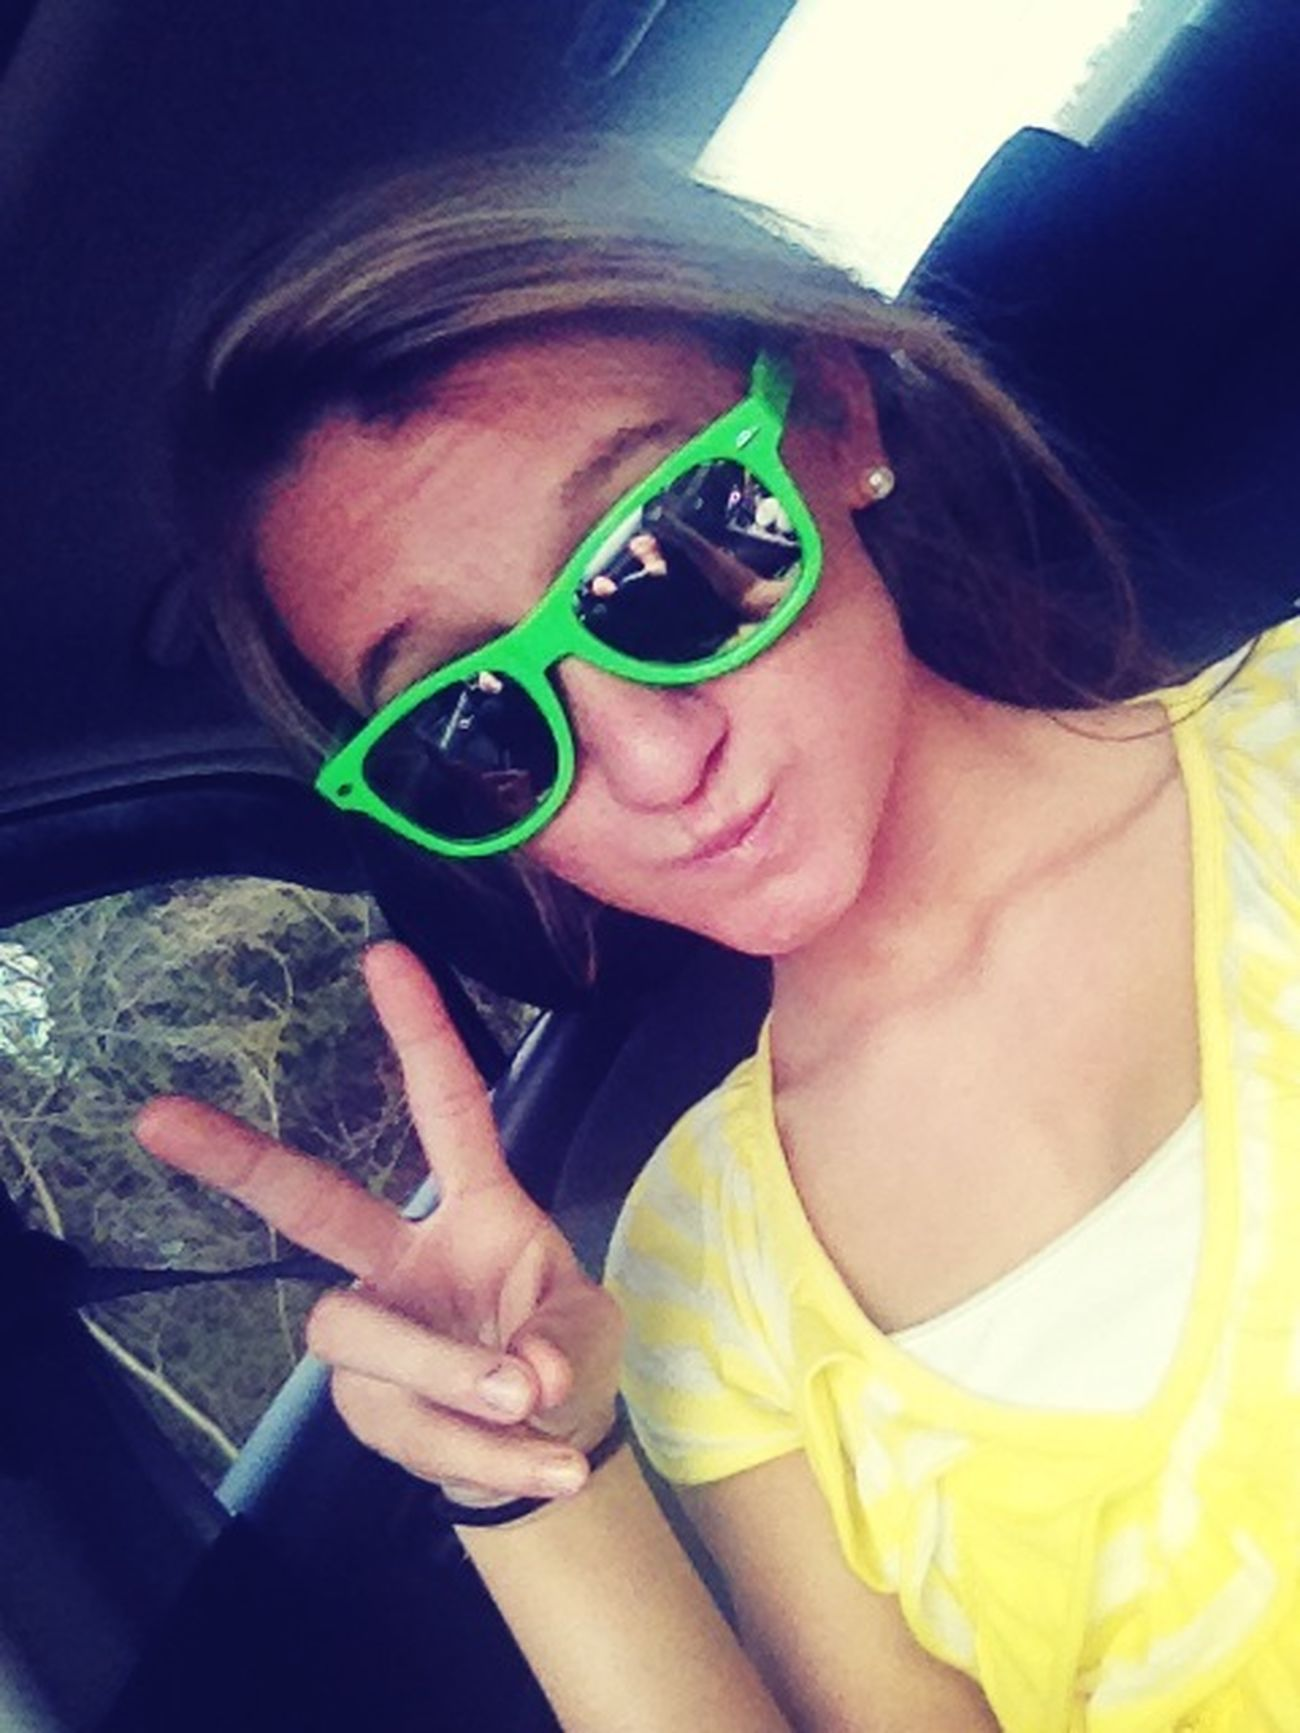 New Nerd Glasses! Yo!✌